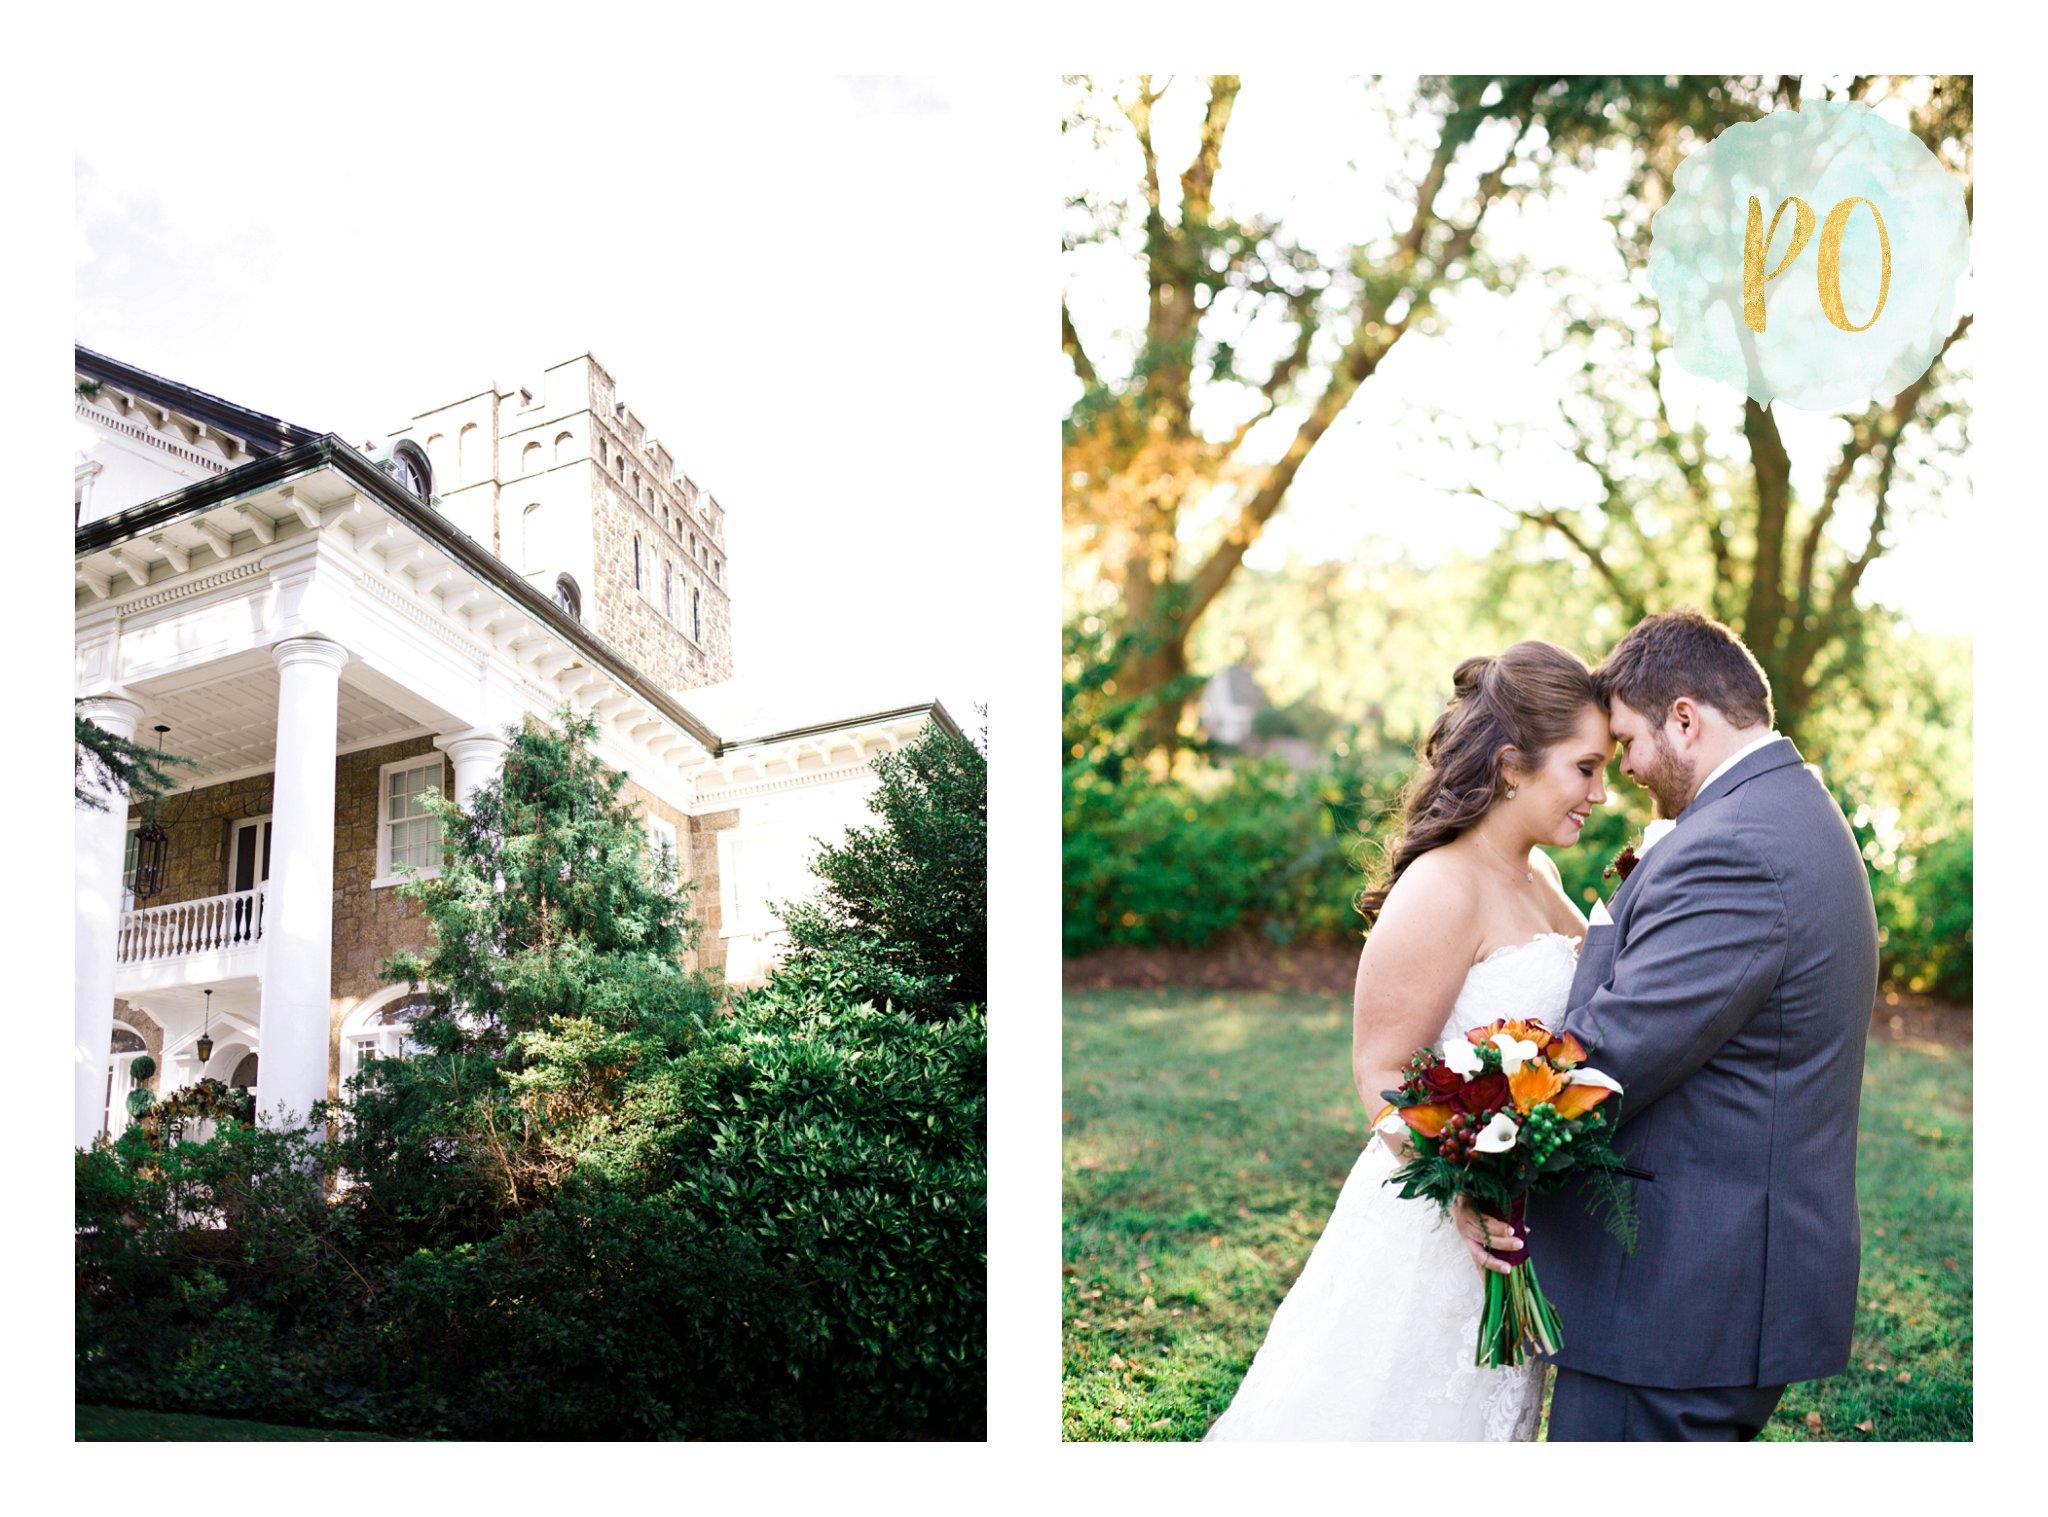 gassaway-mansion-fall-wedding-greenvile-sc-photos_0048.jpg